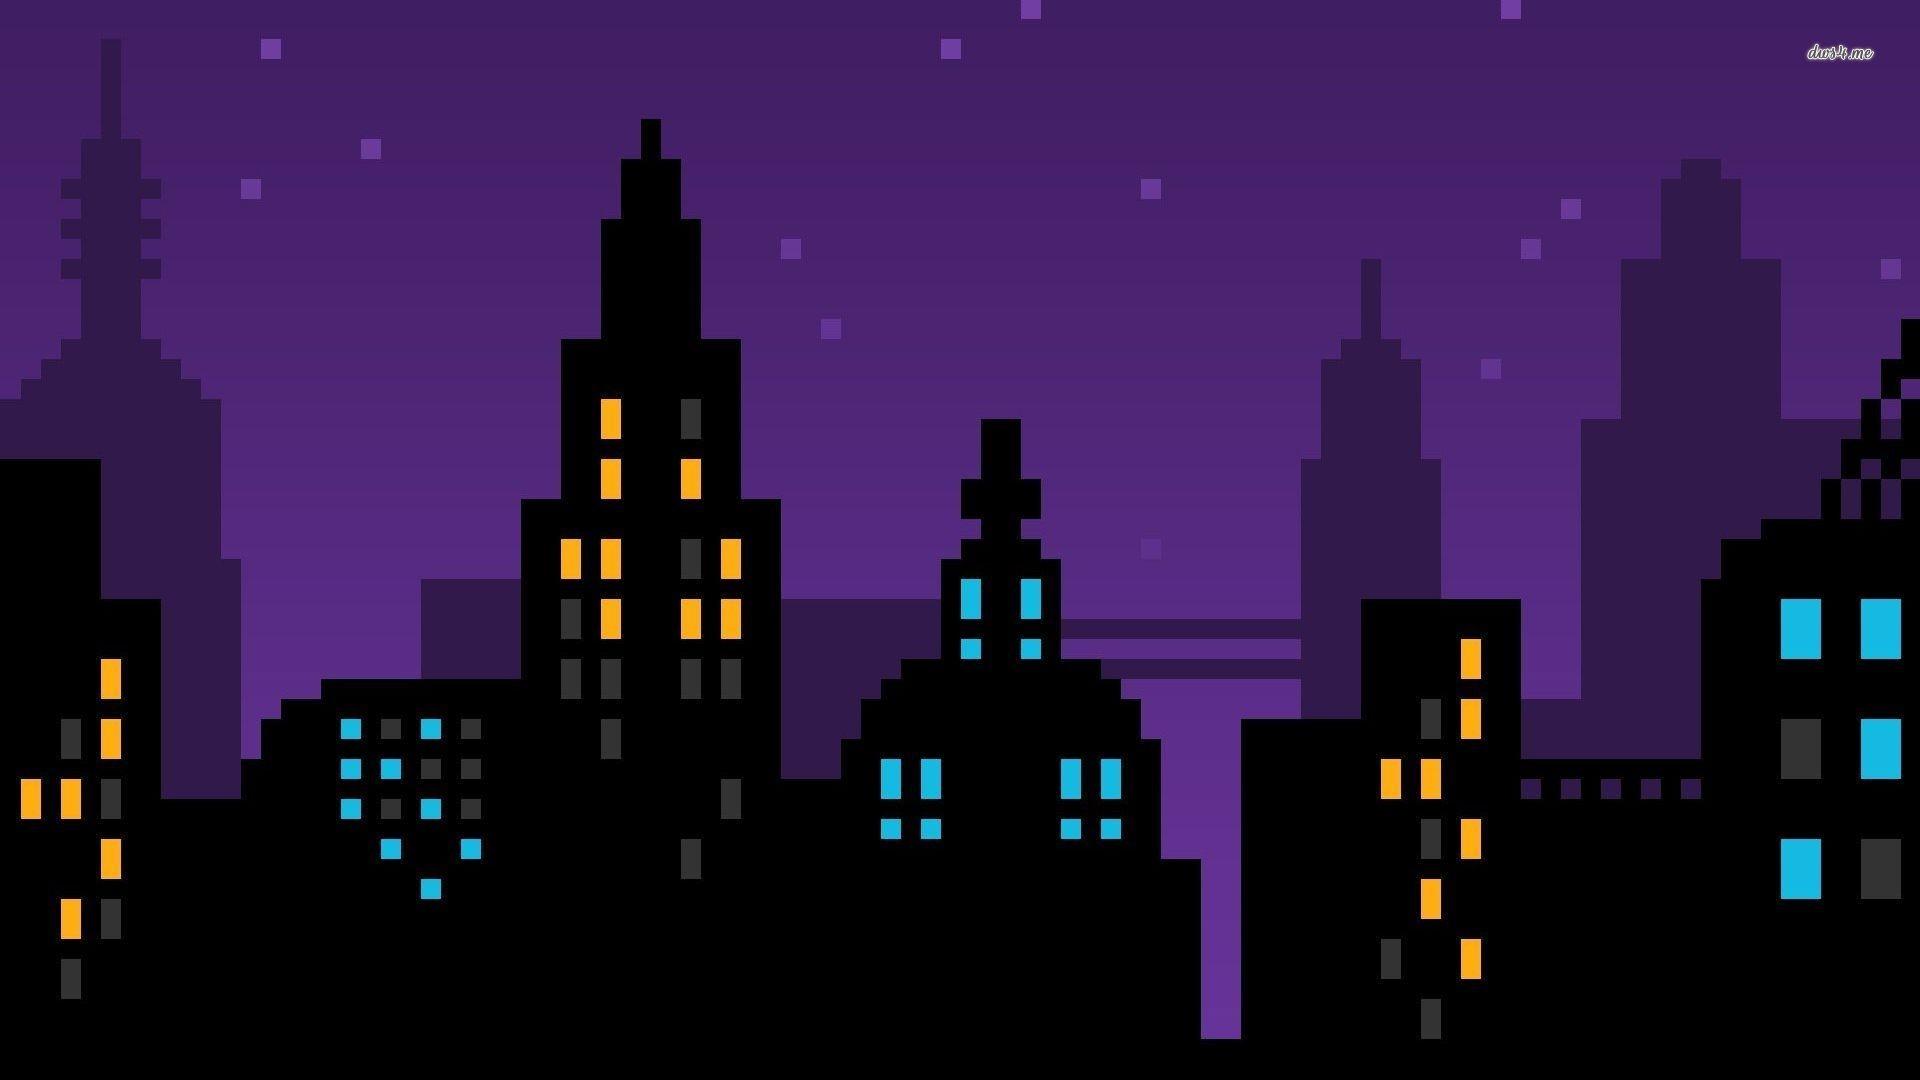 pixel art, #16-bit, #Sega, #Sonic the Hedgehog,